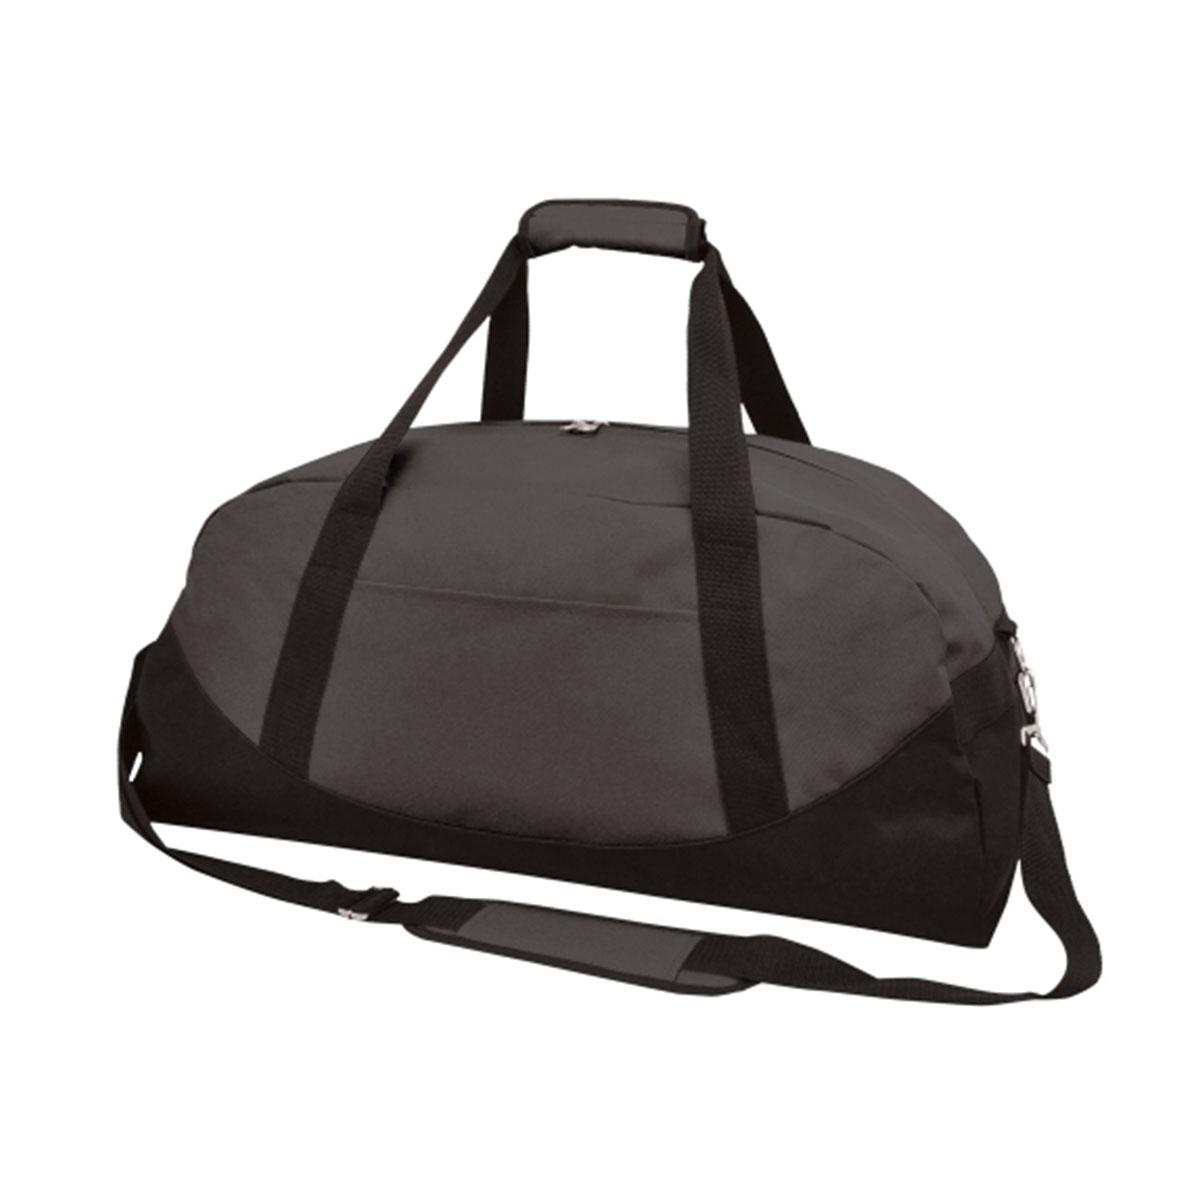 Lunar Sports Bag-Charcoal / Black